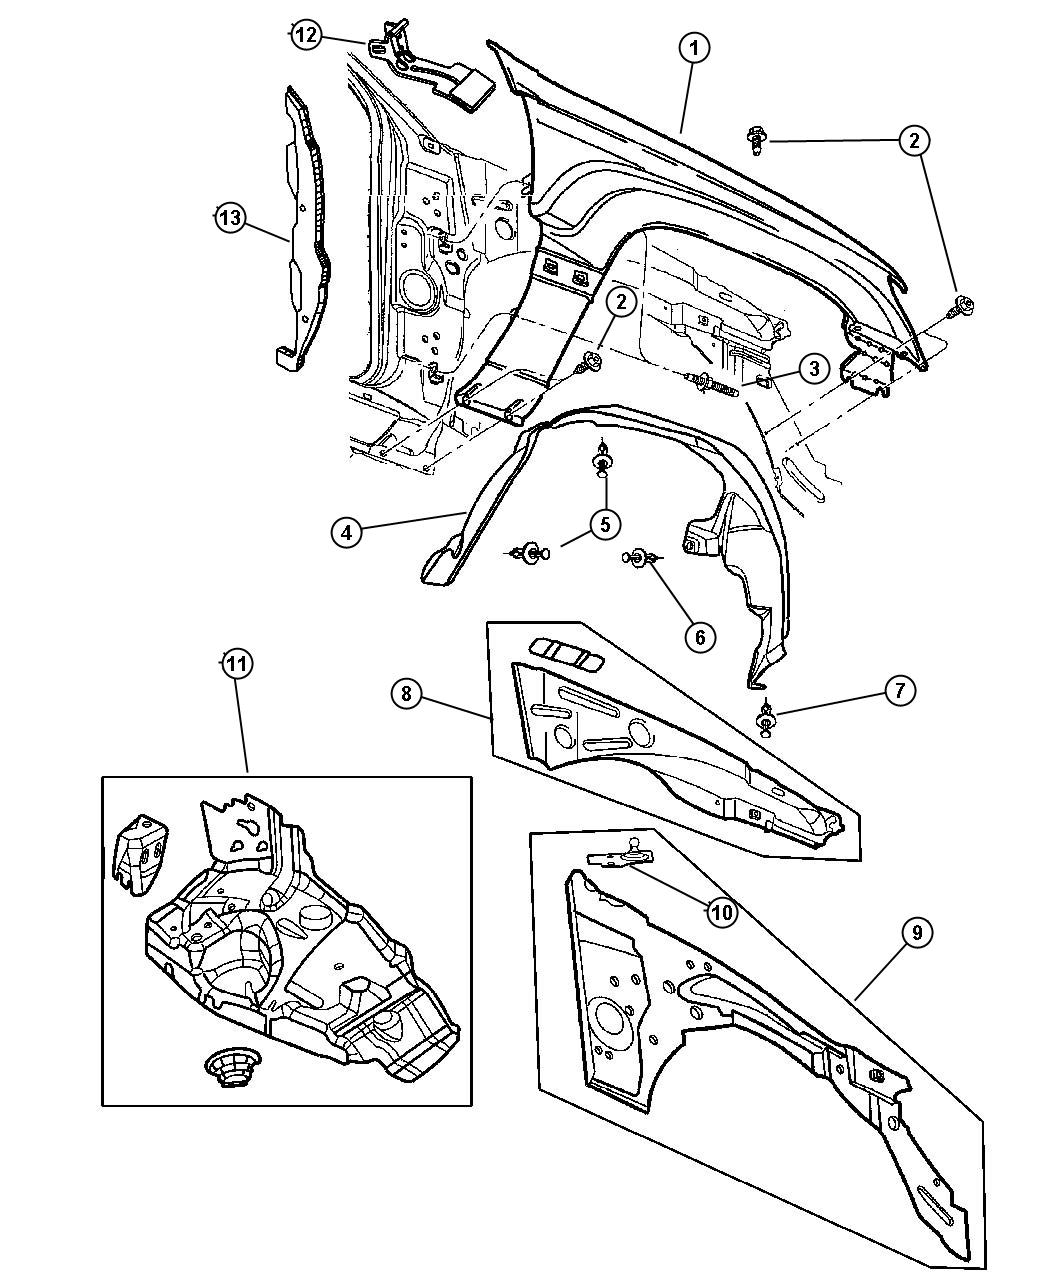 2009 Dodge Sprinter 2500 Support. Front suspension